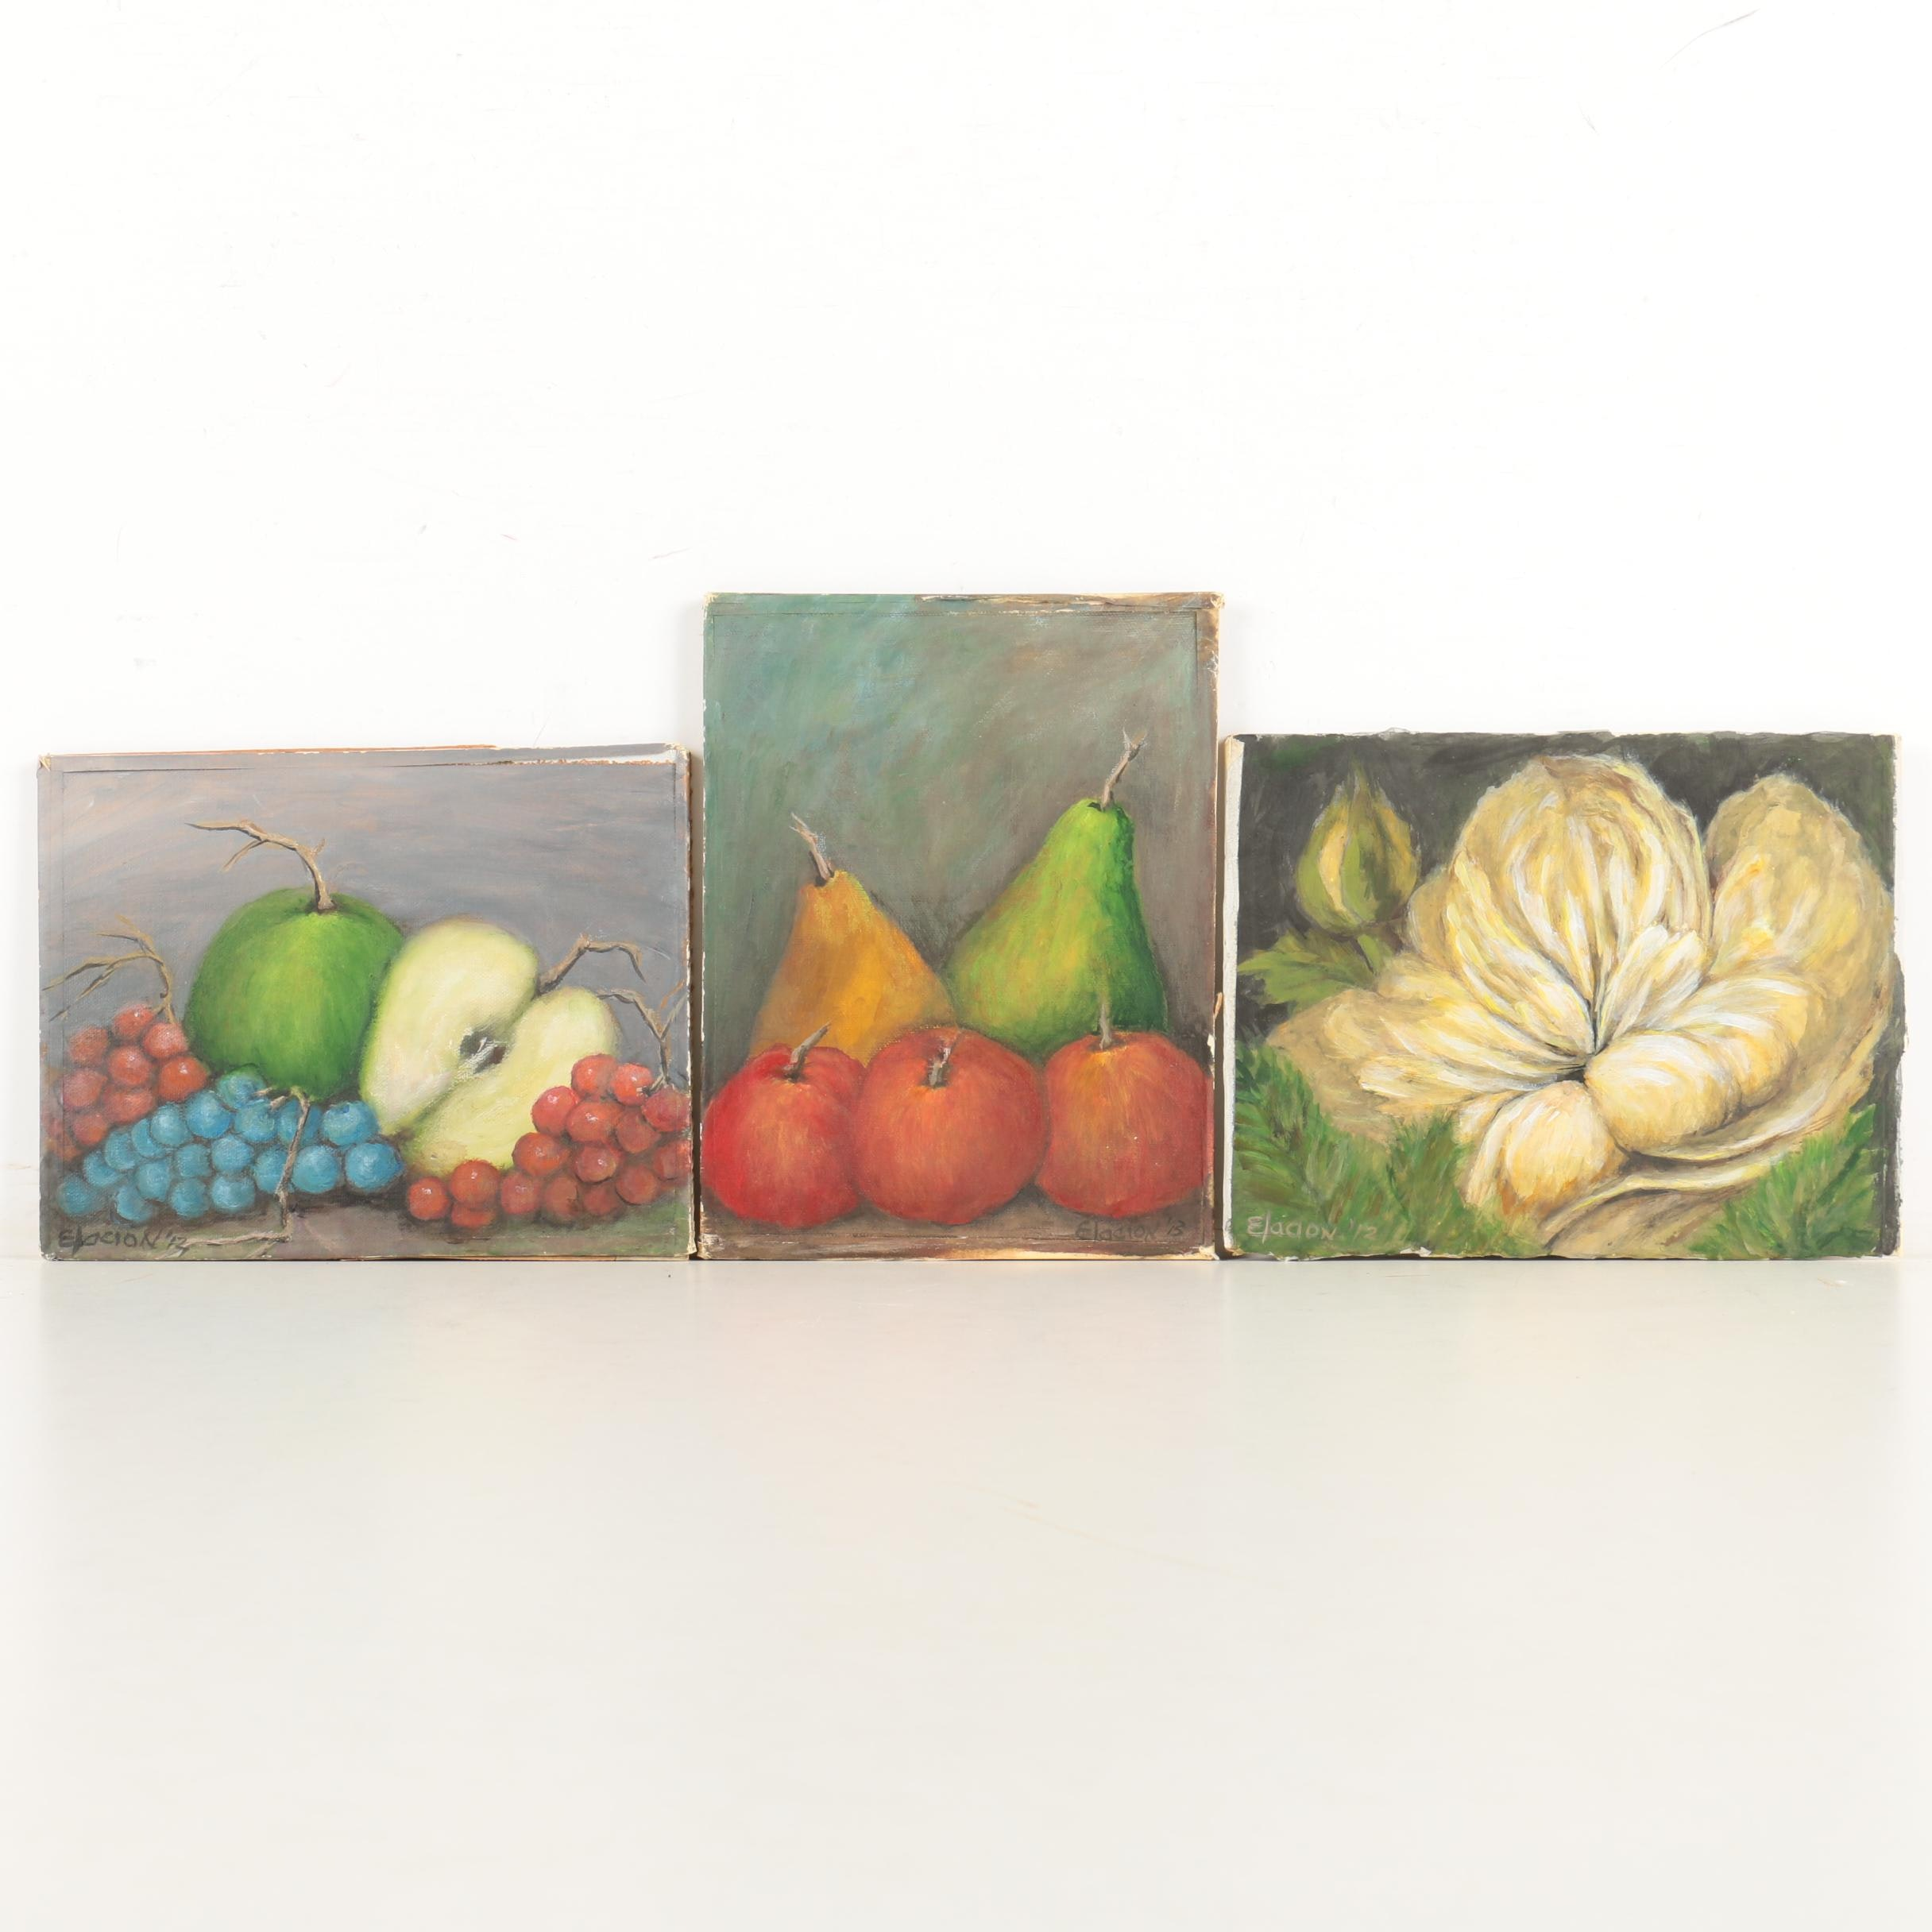 Three Anthony S. Elacion Still Life Oil Paintings on Board